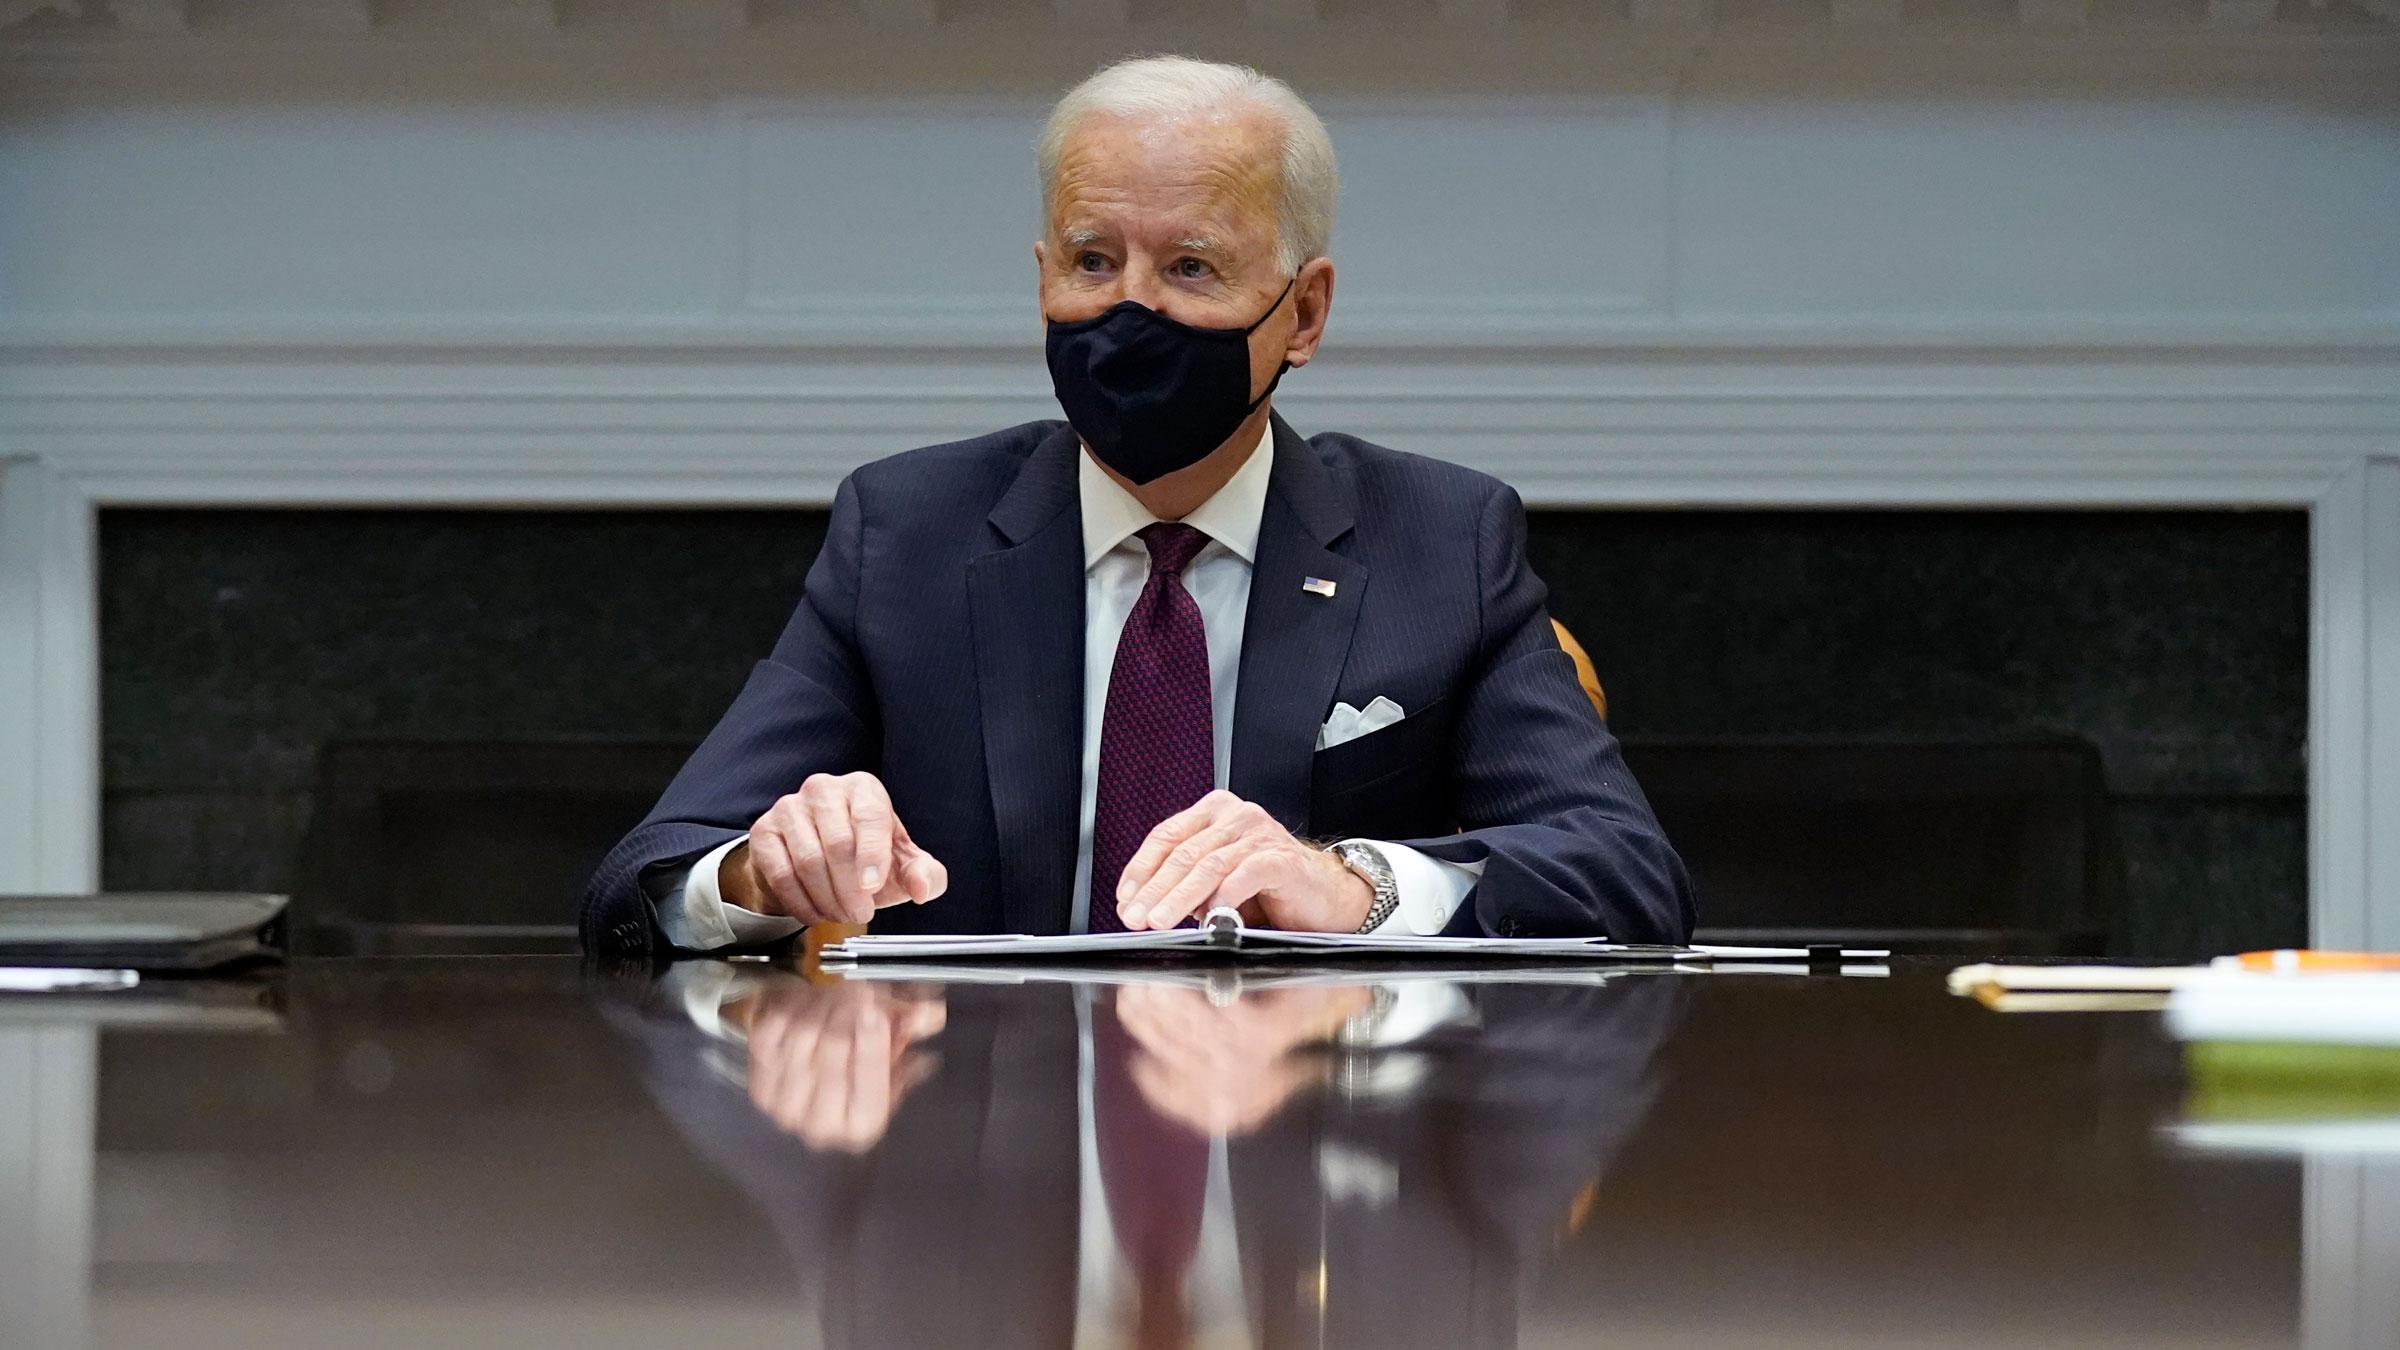 President Joe Biden speaks at a White House economic briefing on Friday.